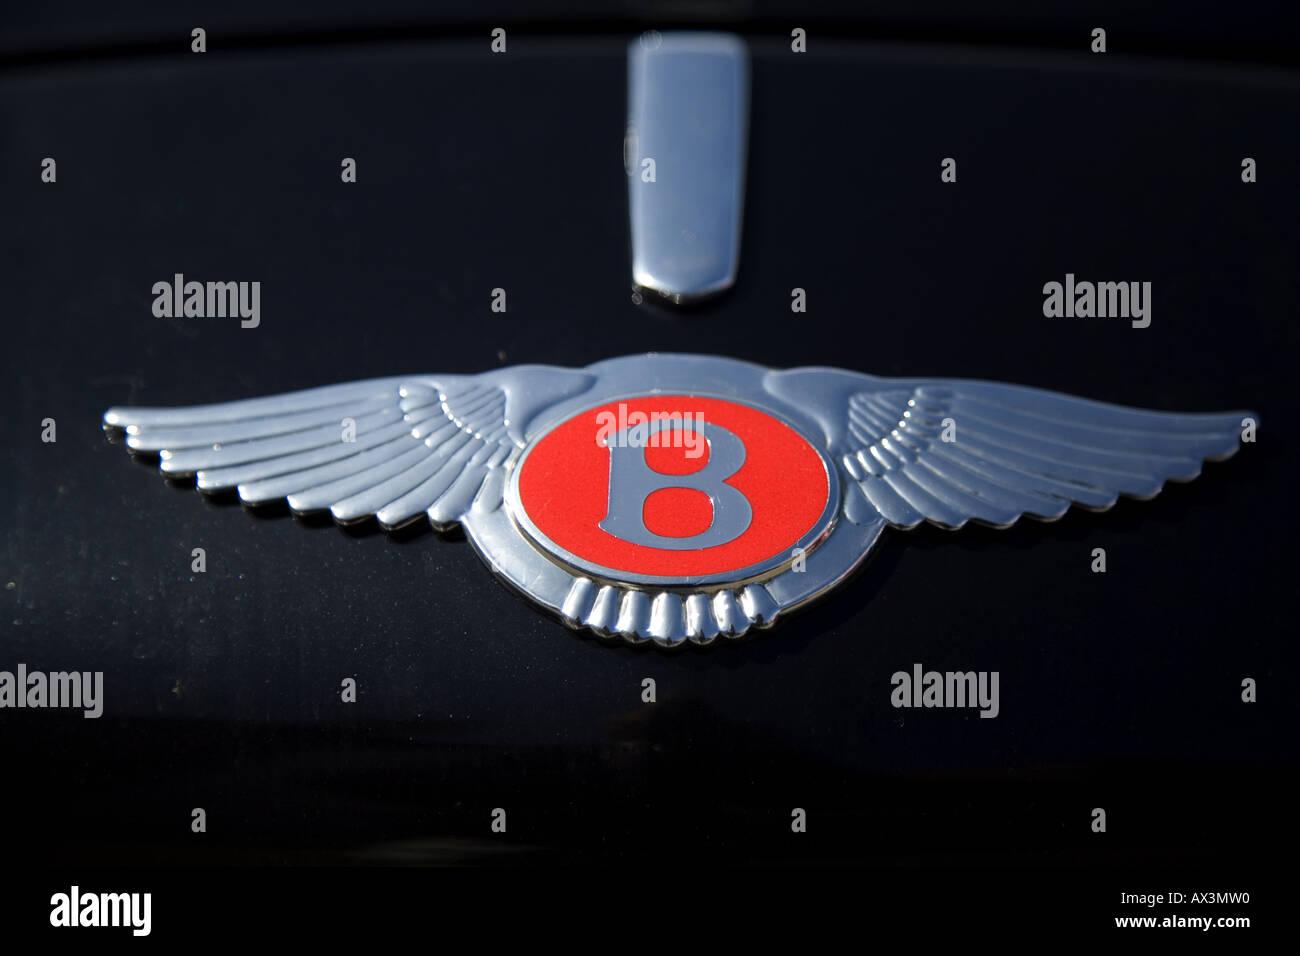 Bentley Wings Logo Stock Photos & Bentley Wings Logo Stock